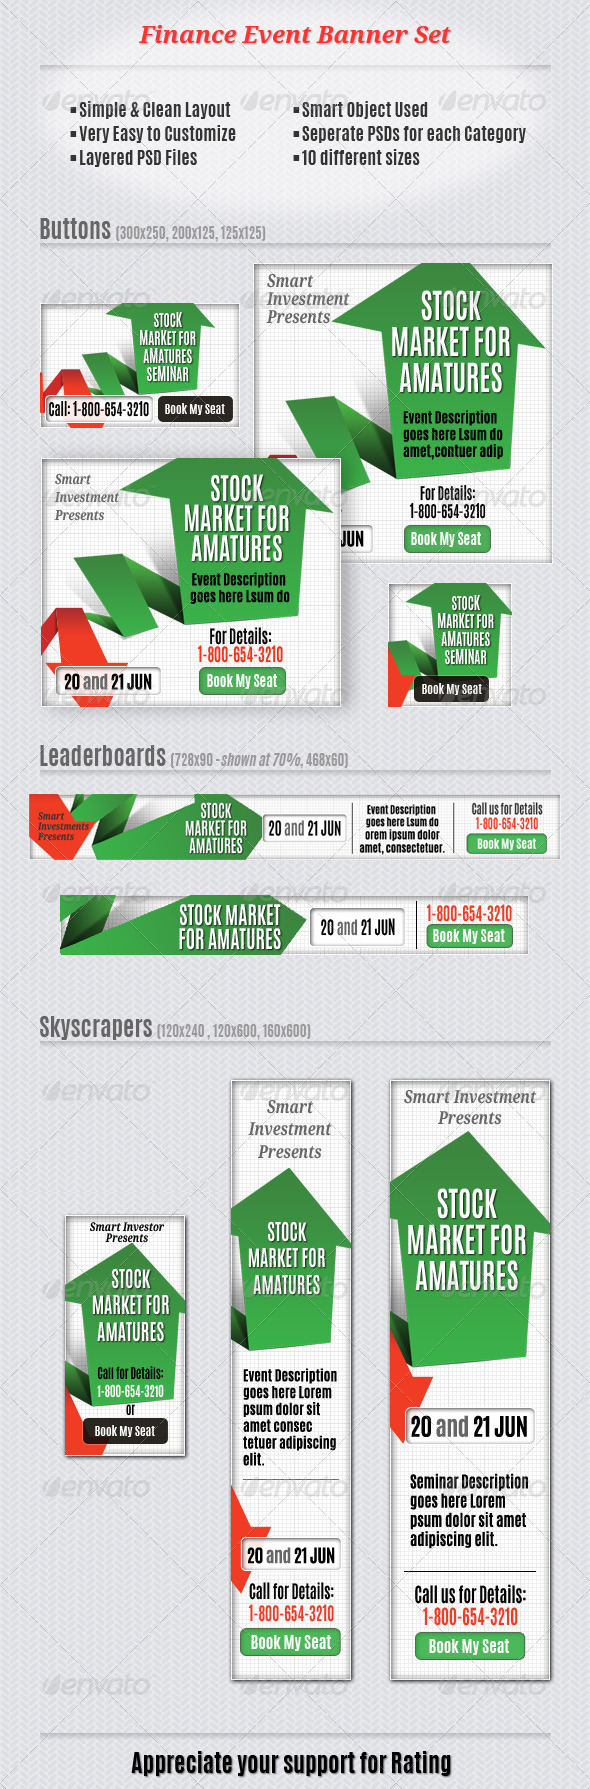 GraphicRiver Finance Event Banner Set 5615790